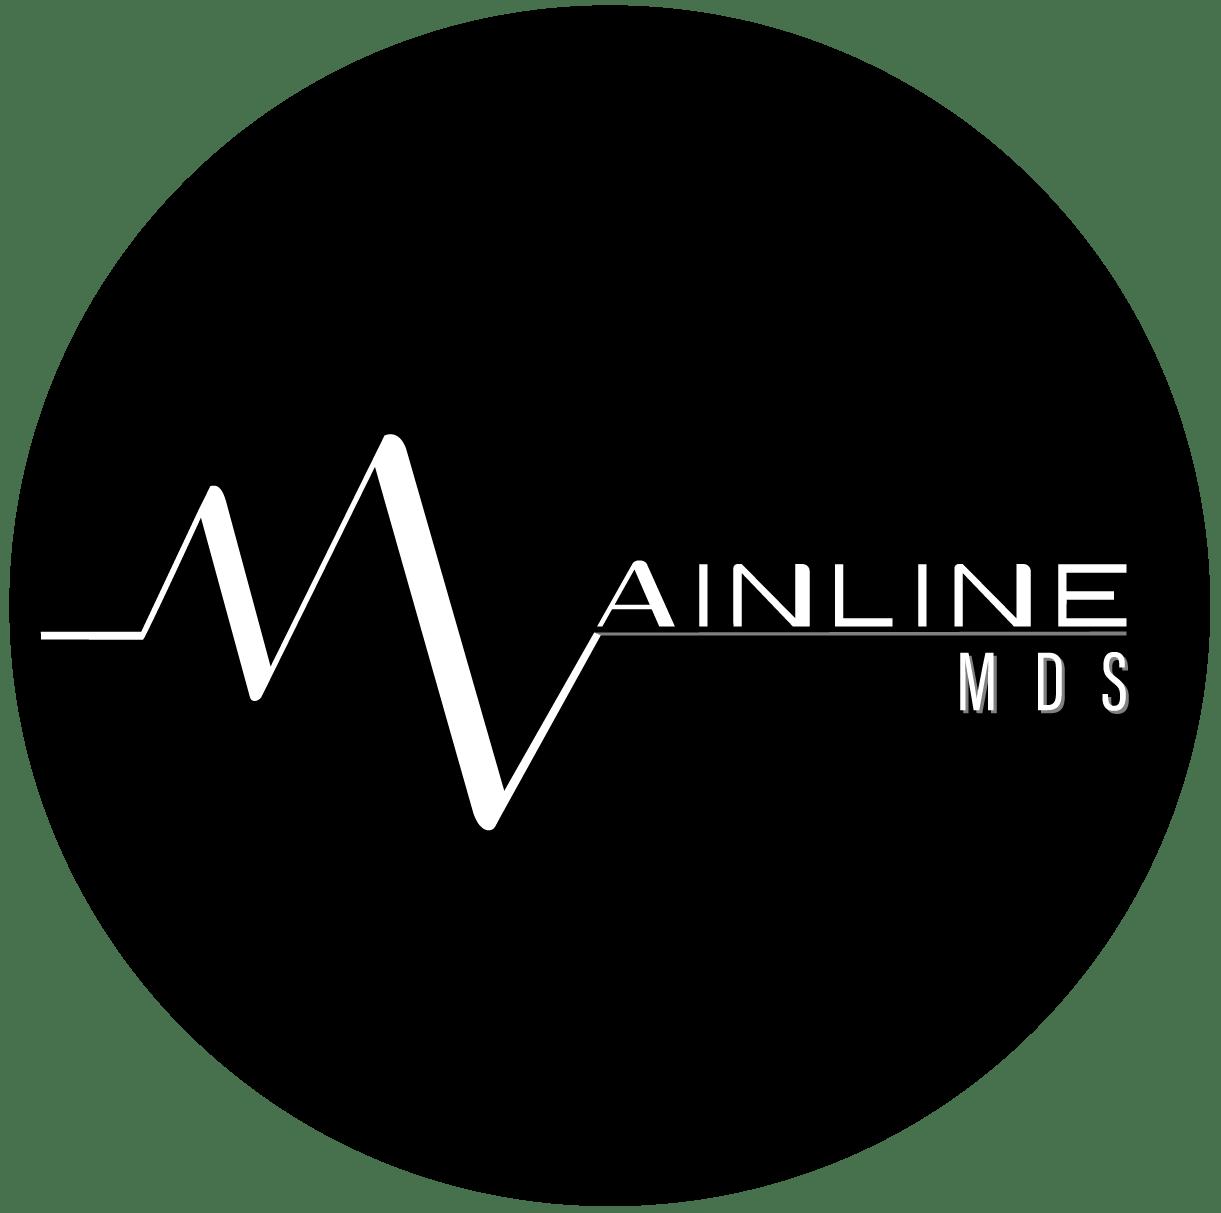 Mainline MDS